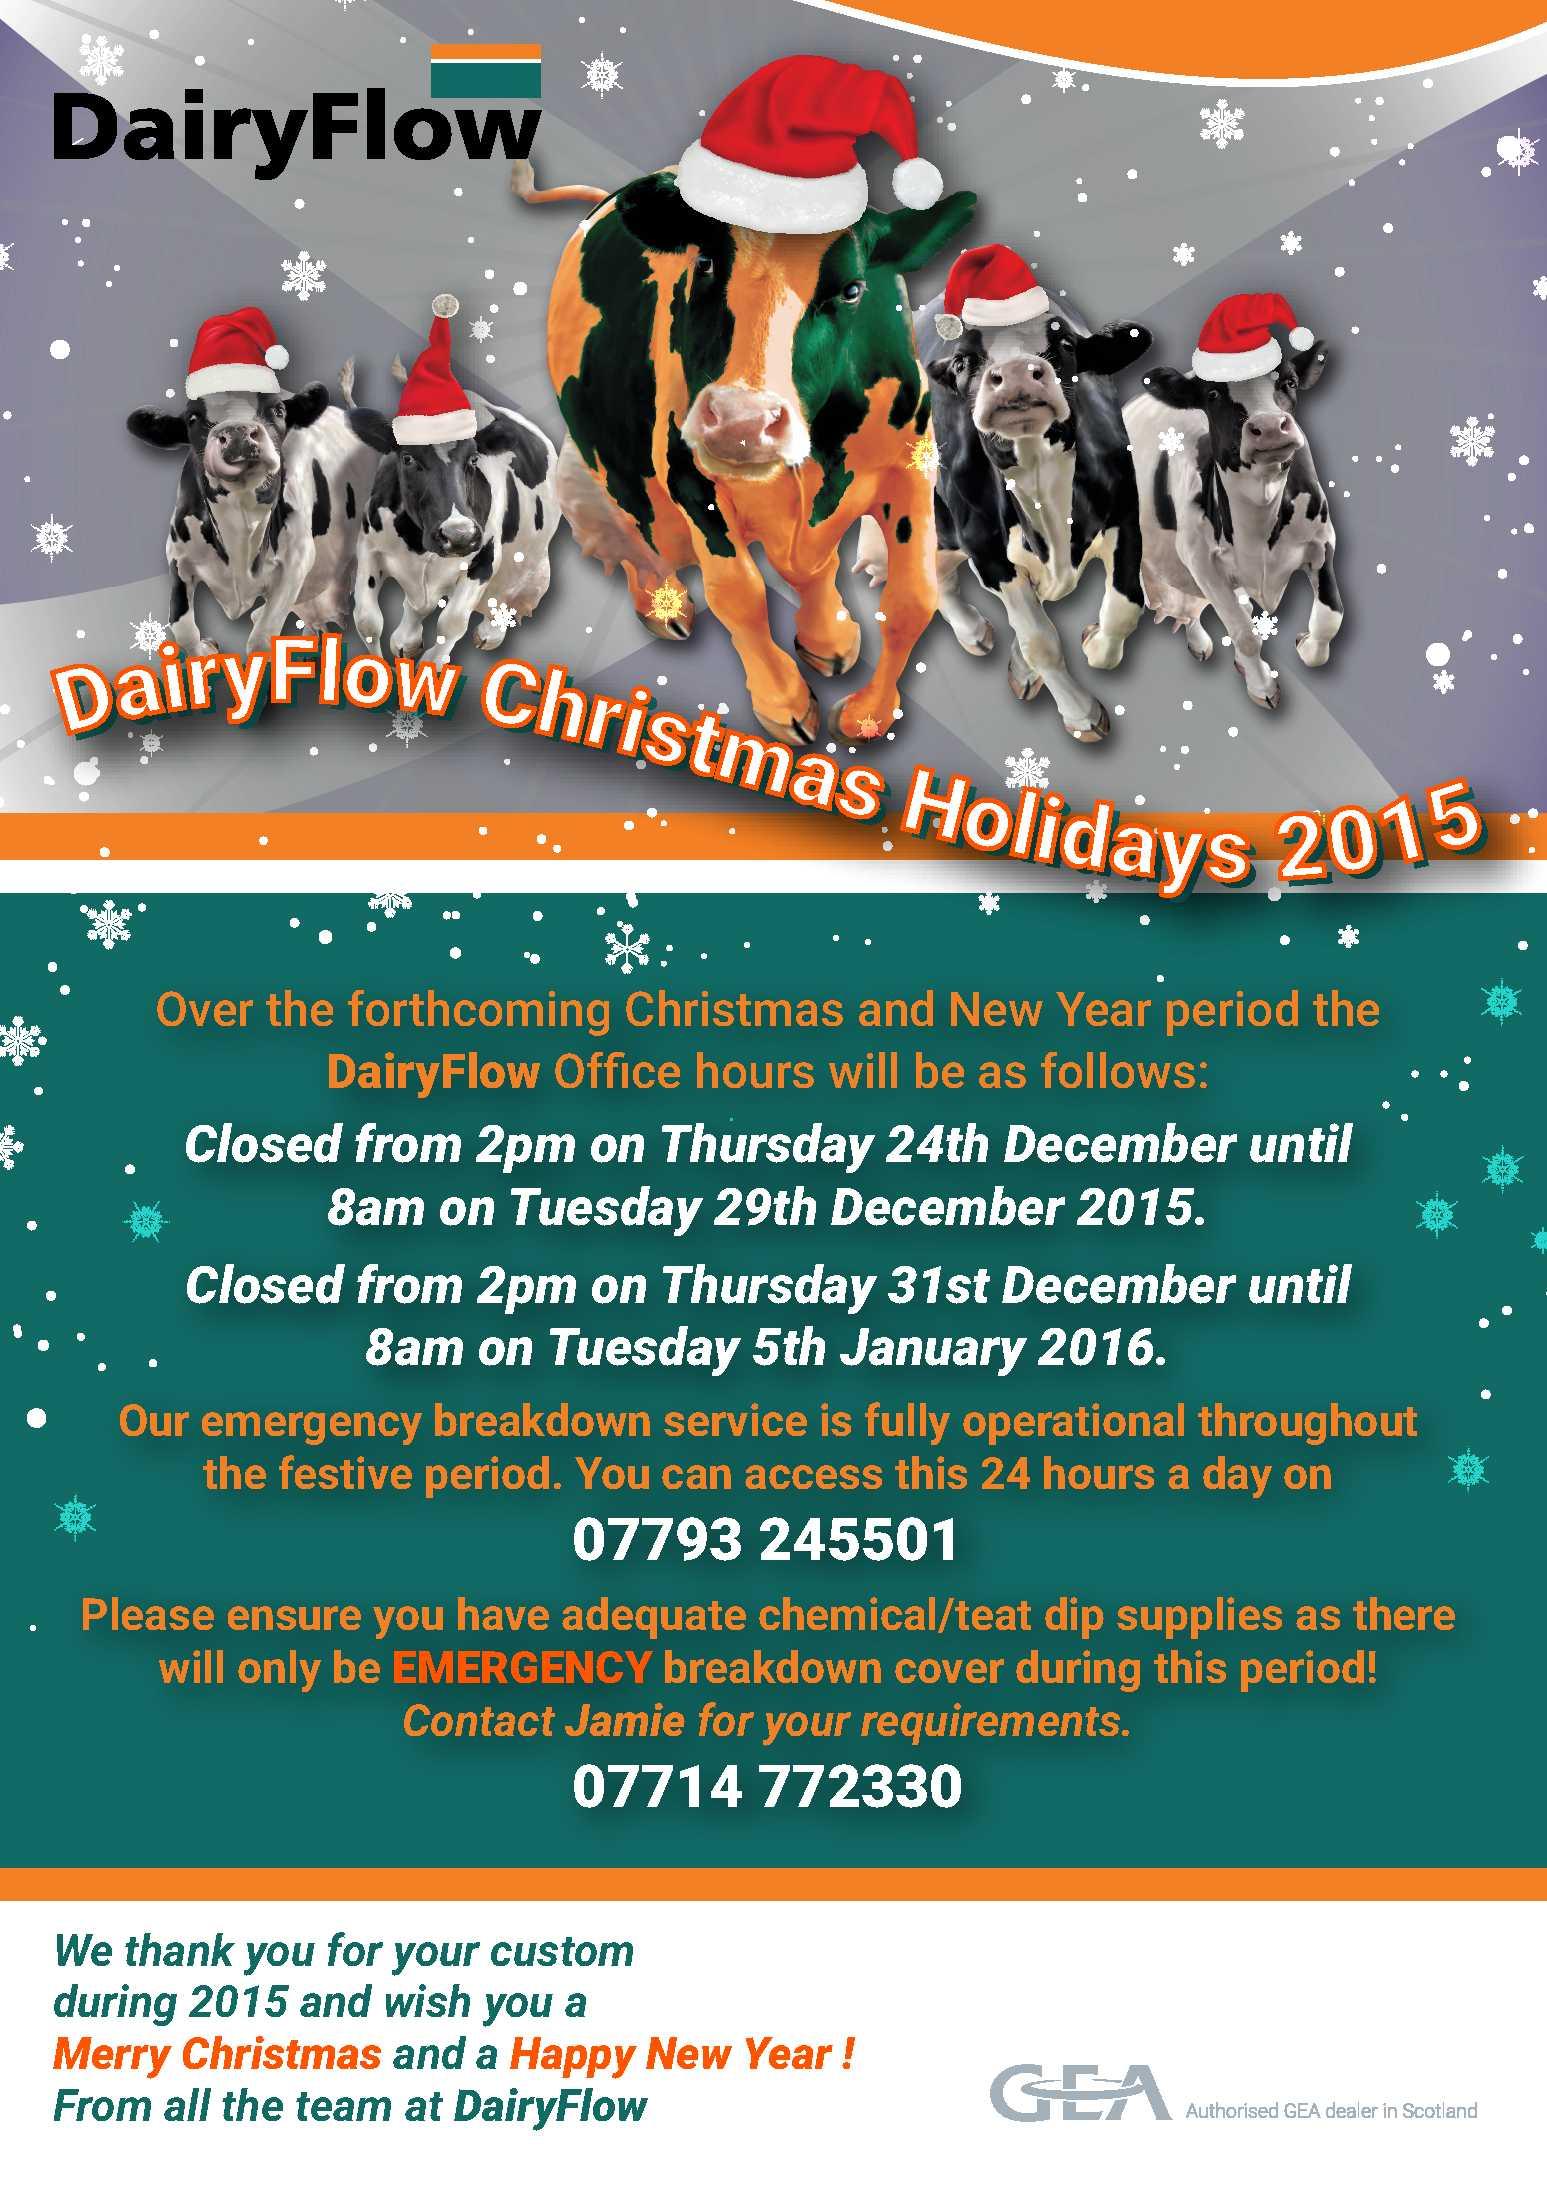 DairyFlow Xmas Flyer (DAi11-15FLY)